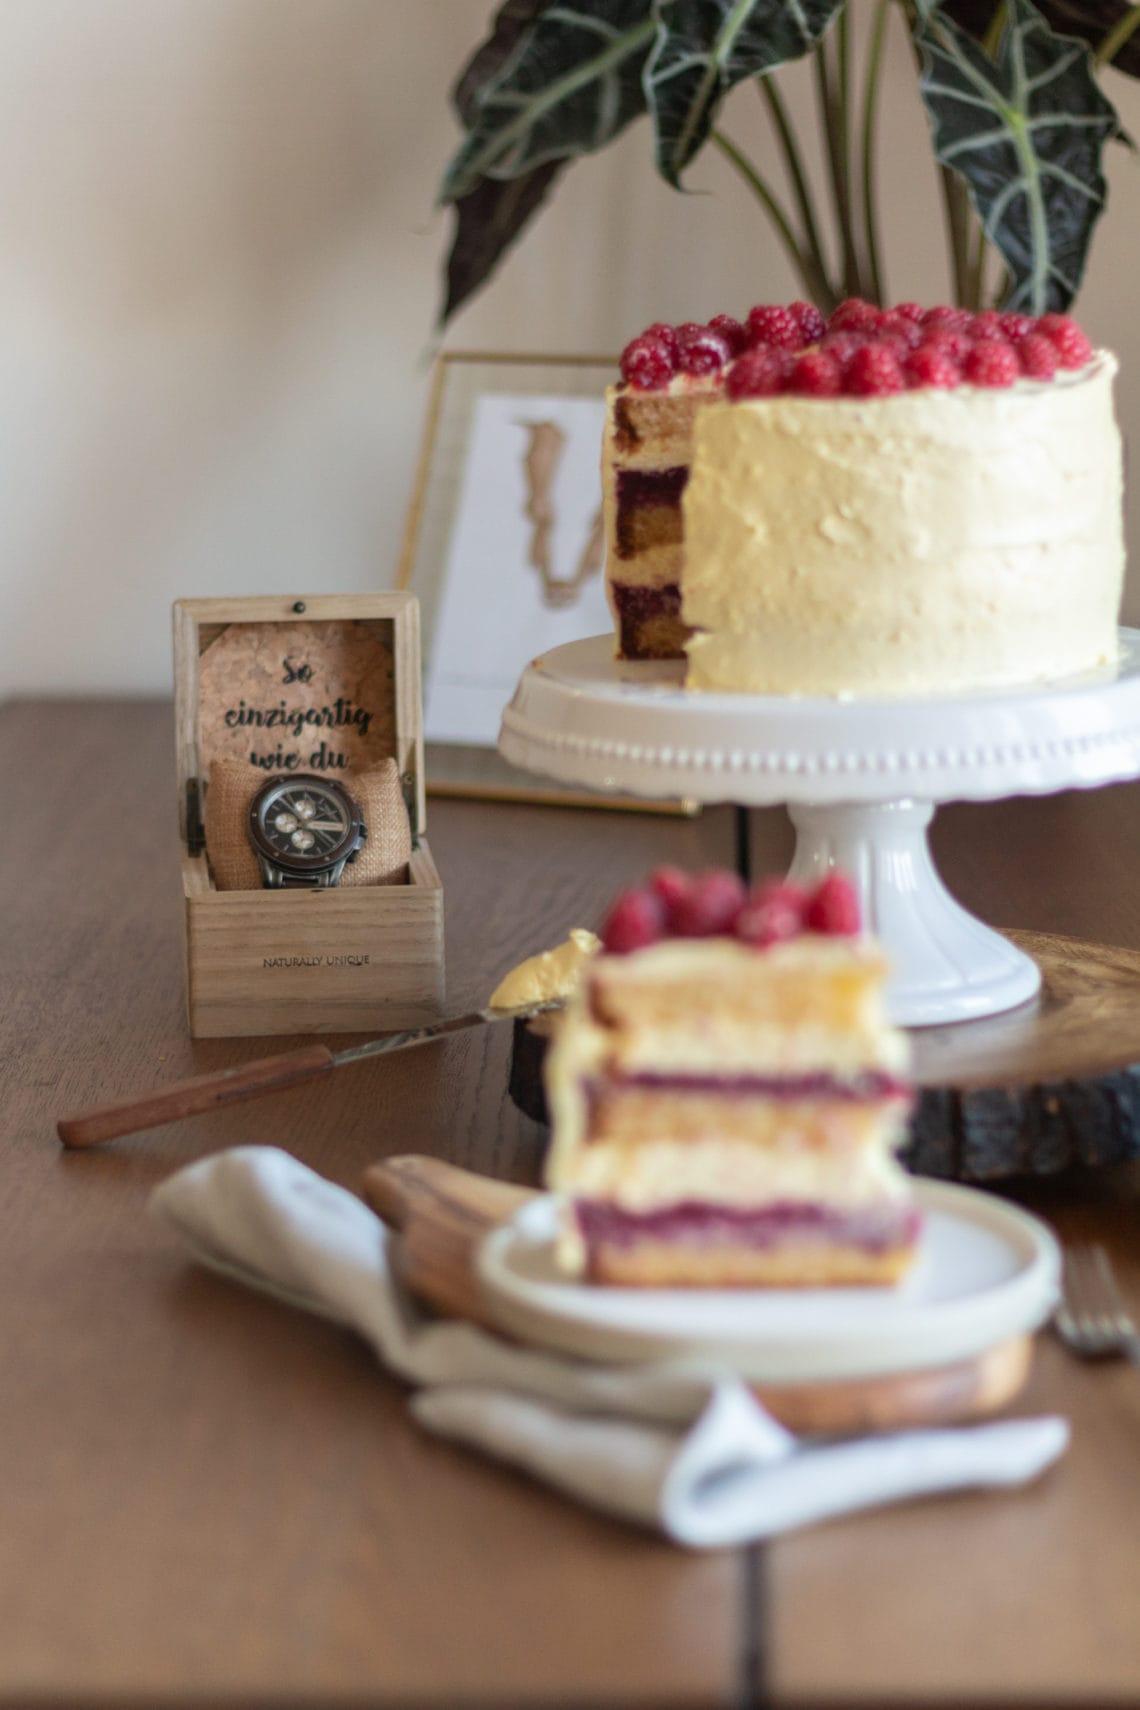 Himbeer-Vanille-Törtchen  Holzkern Uhr im Fokus